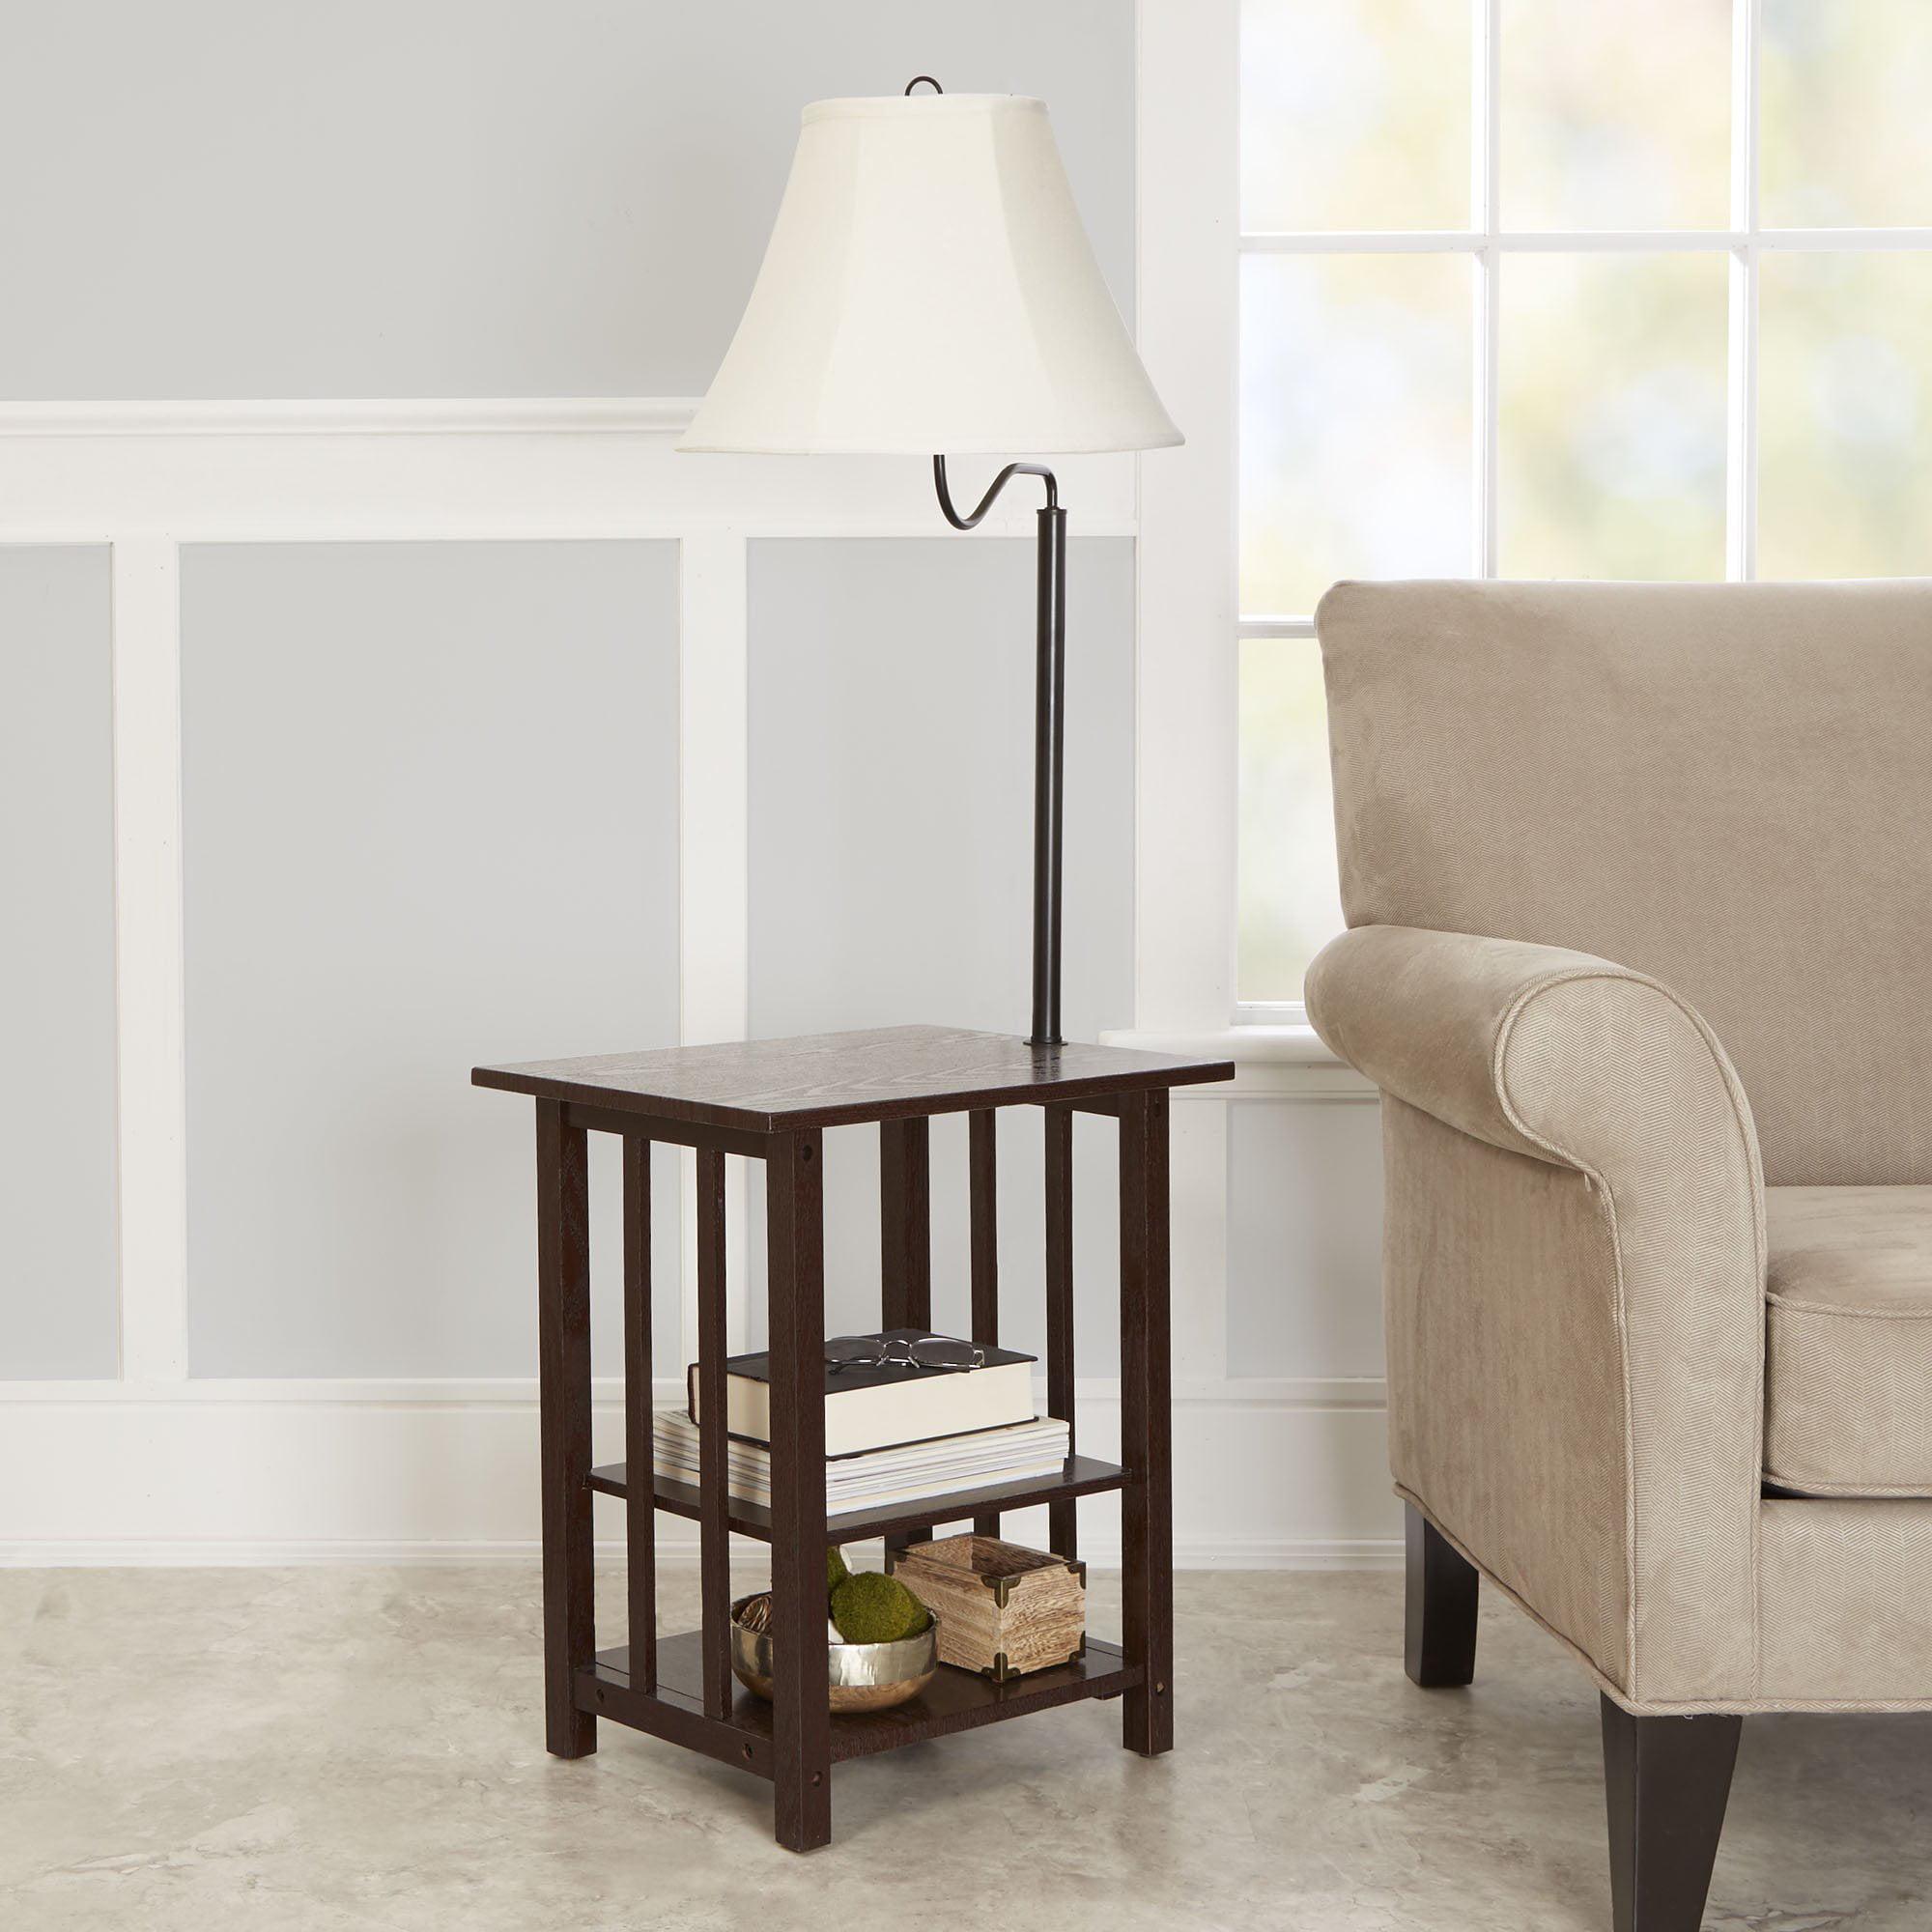 Better Homes Gardens 3 Rack End Table Floor Lamp Espresso Finish